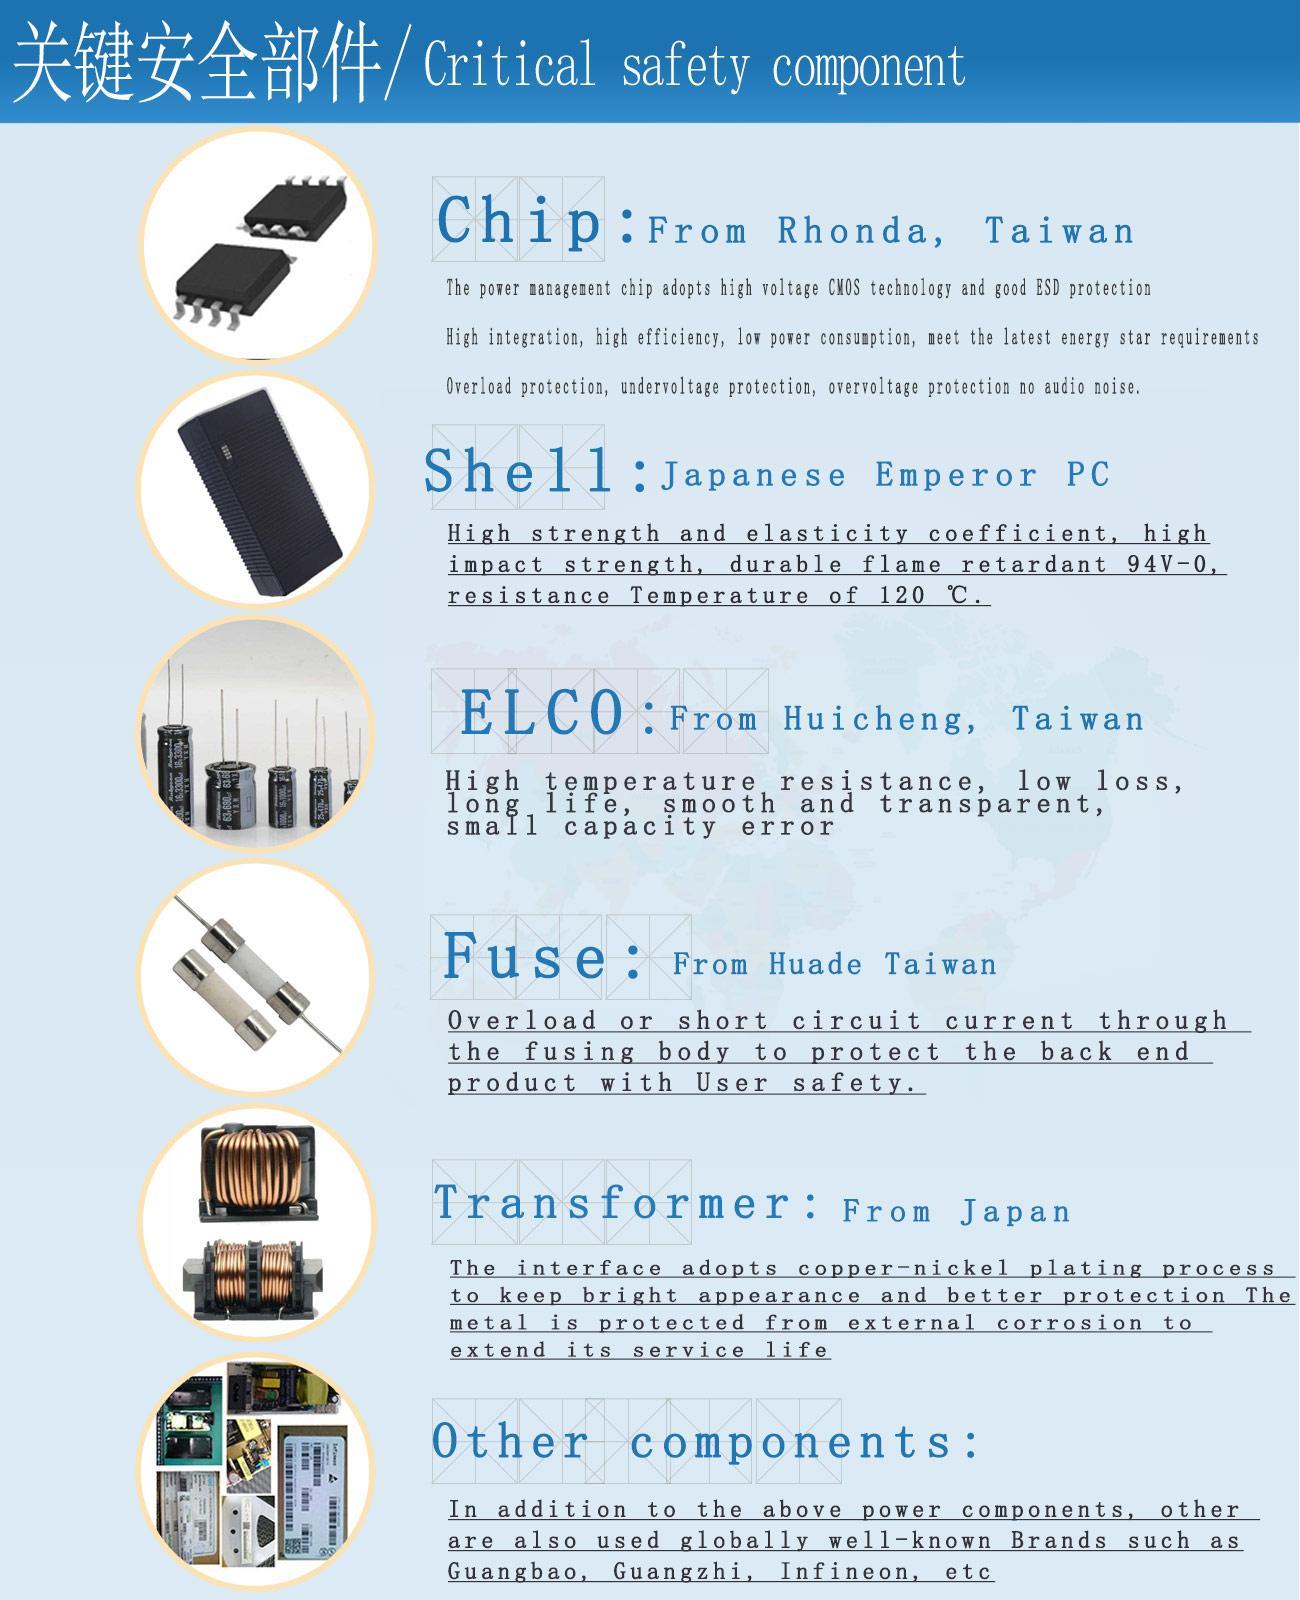 14.6V1A 铁锂电池充电器 14.6V充电器 ROHS认证充电器 8